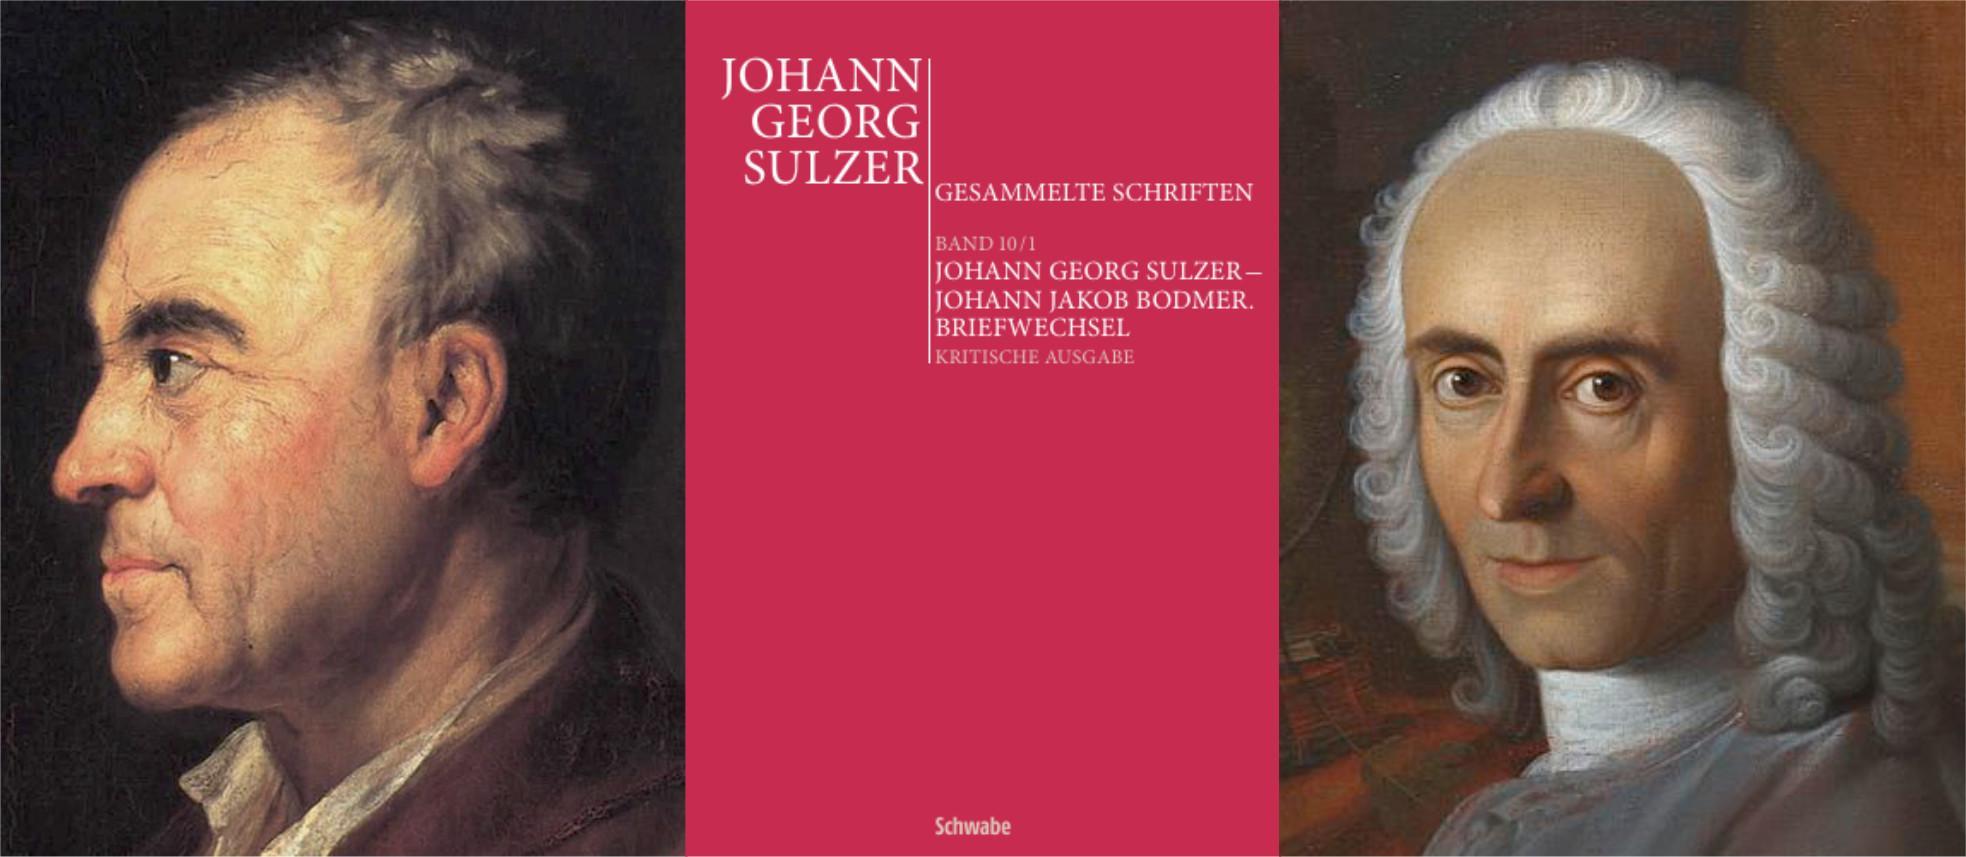 Buchvernissage: Briefwechsel Johann Georg Sulzer - Johann Jakob Bodmer